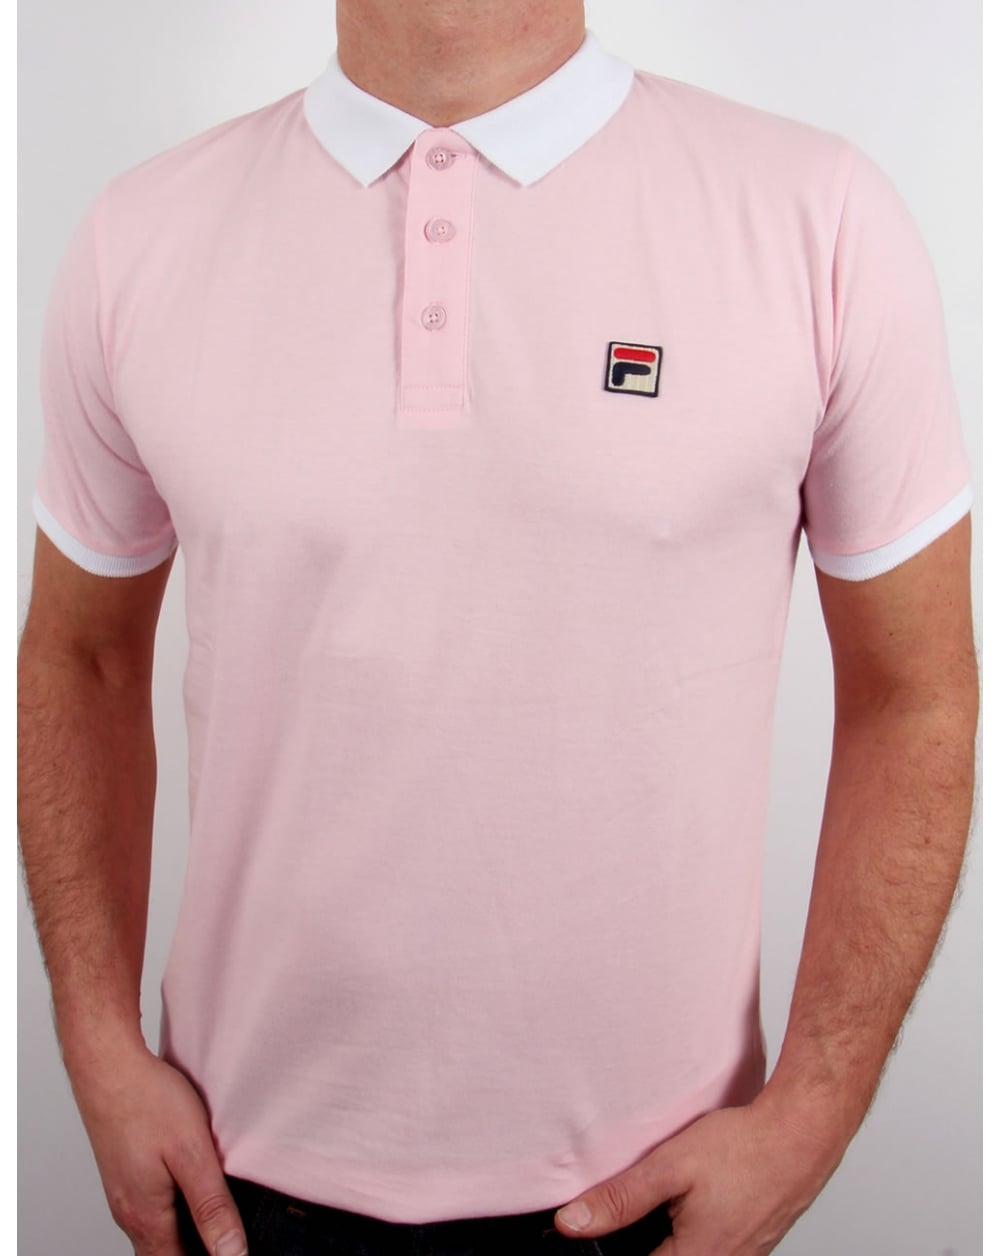 c36b1d93 Fila Vintage Peleo Polo Shirt Pink - fila peleo polo shirt, mens